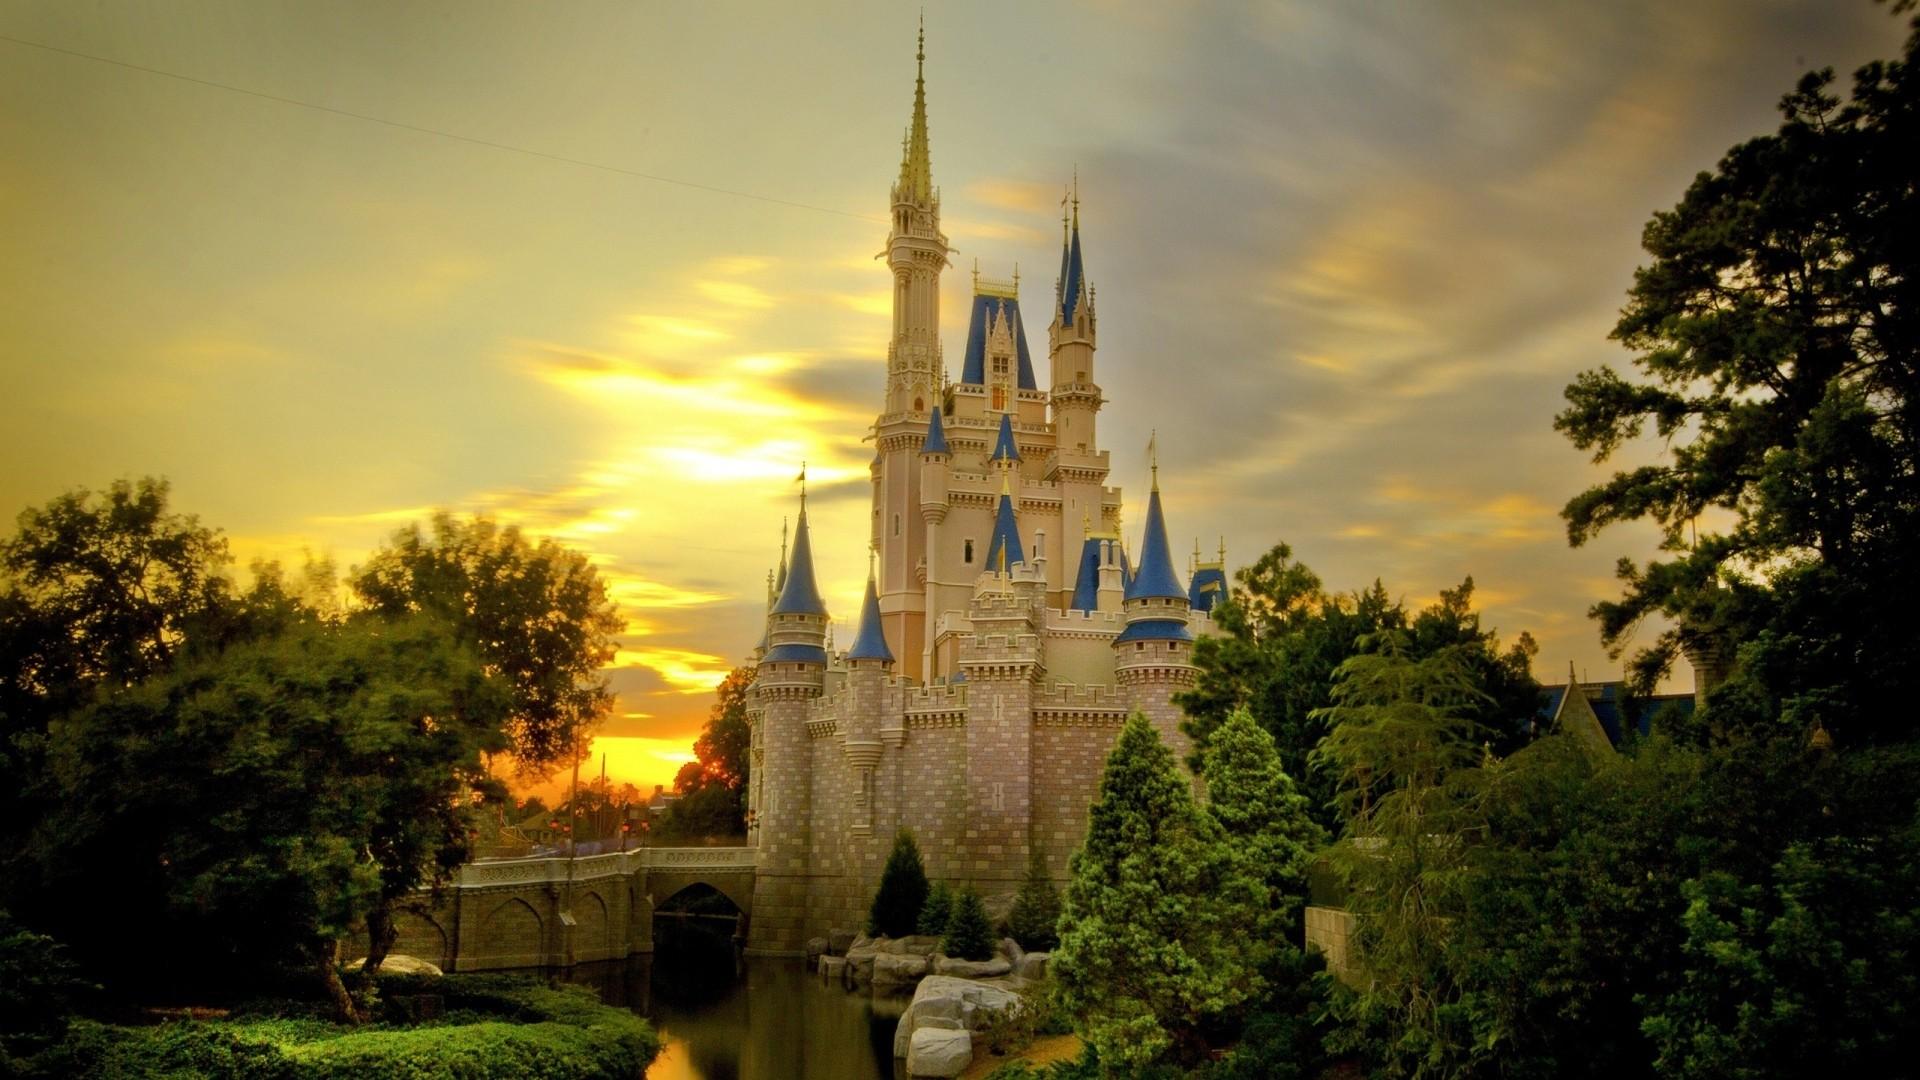 Castle Download Wallpaper